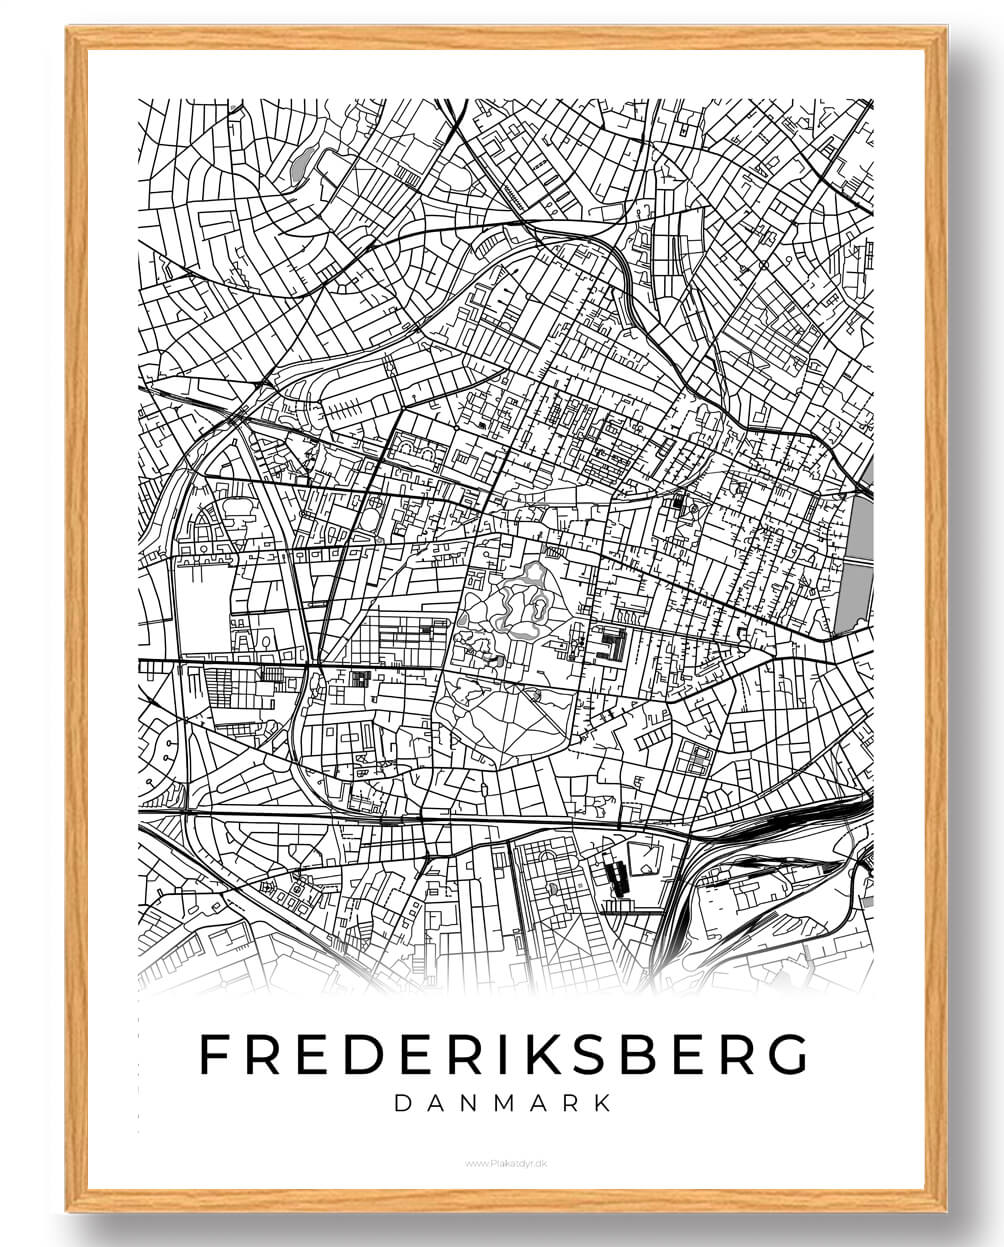 Frederiksberg-hvid-byplakat-1